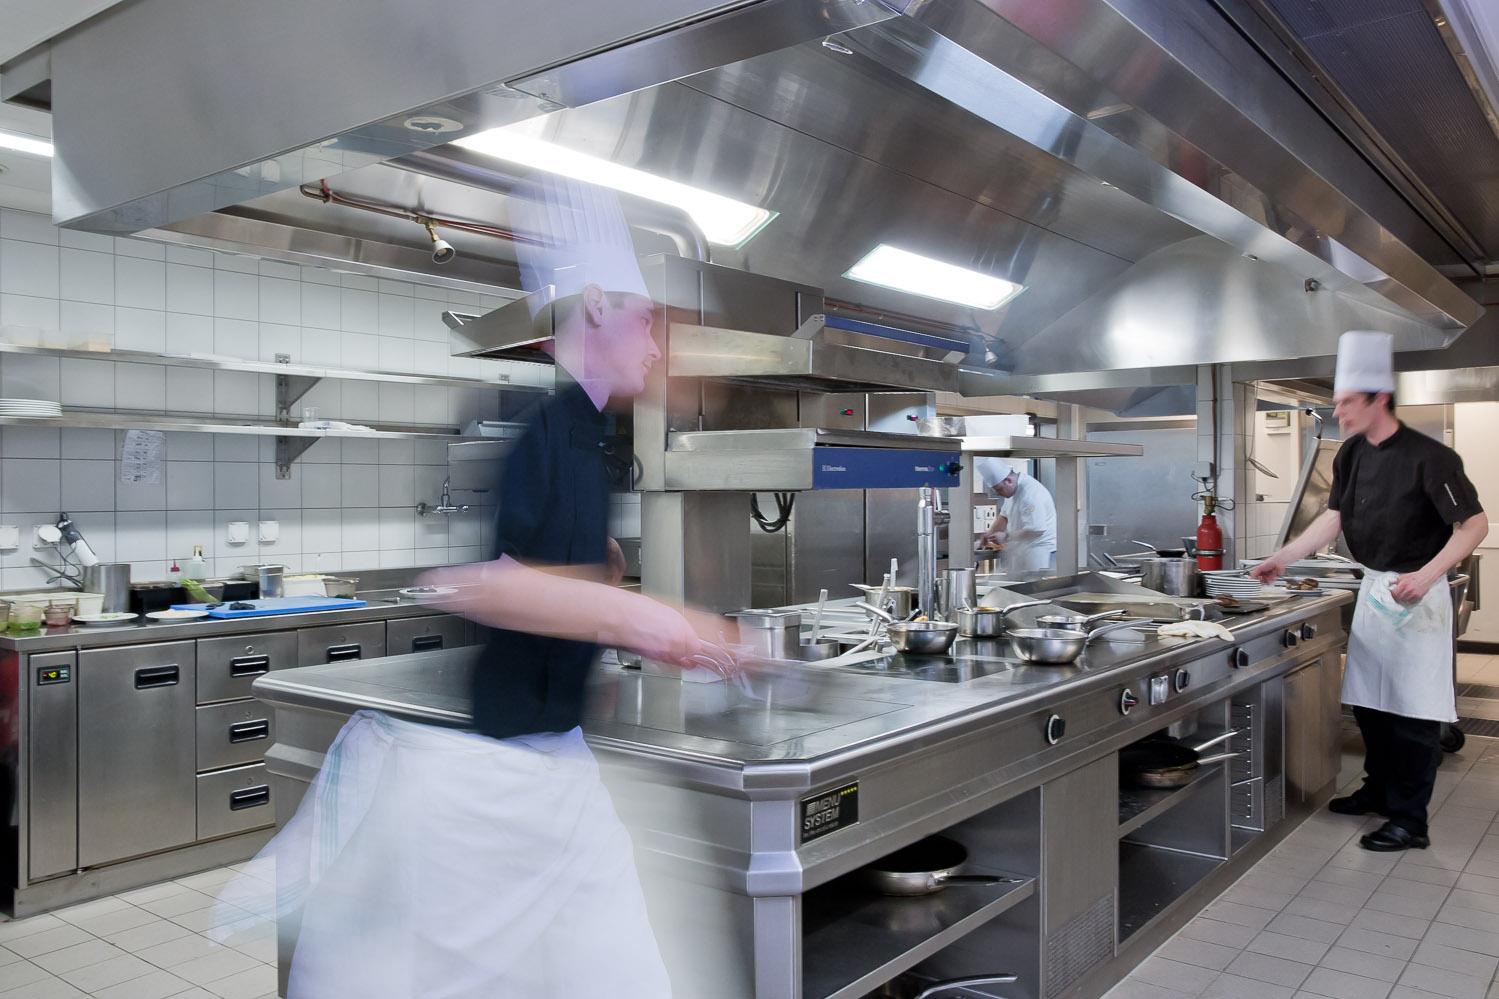 Intercontinental gen ve recrute demi chef de partie for Offre emploi chef gerant restauration collective